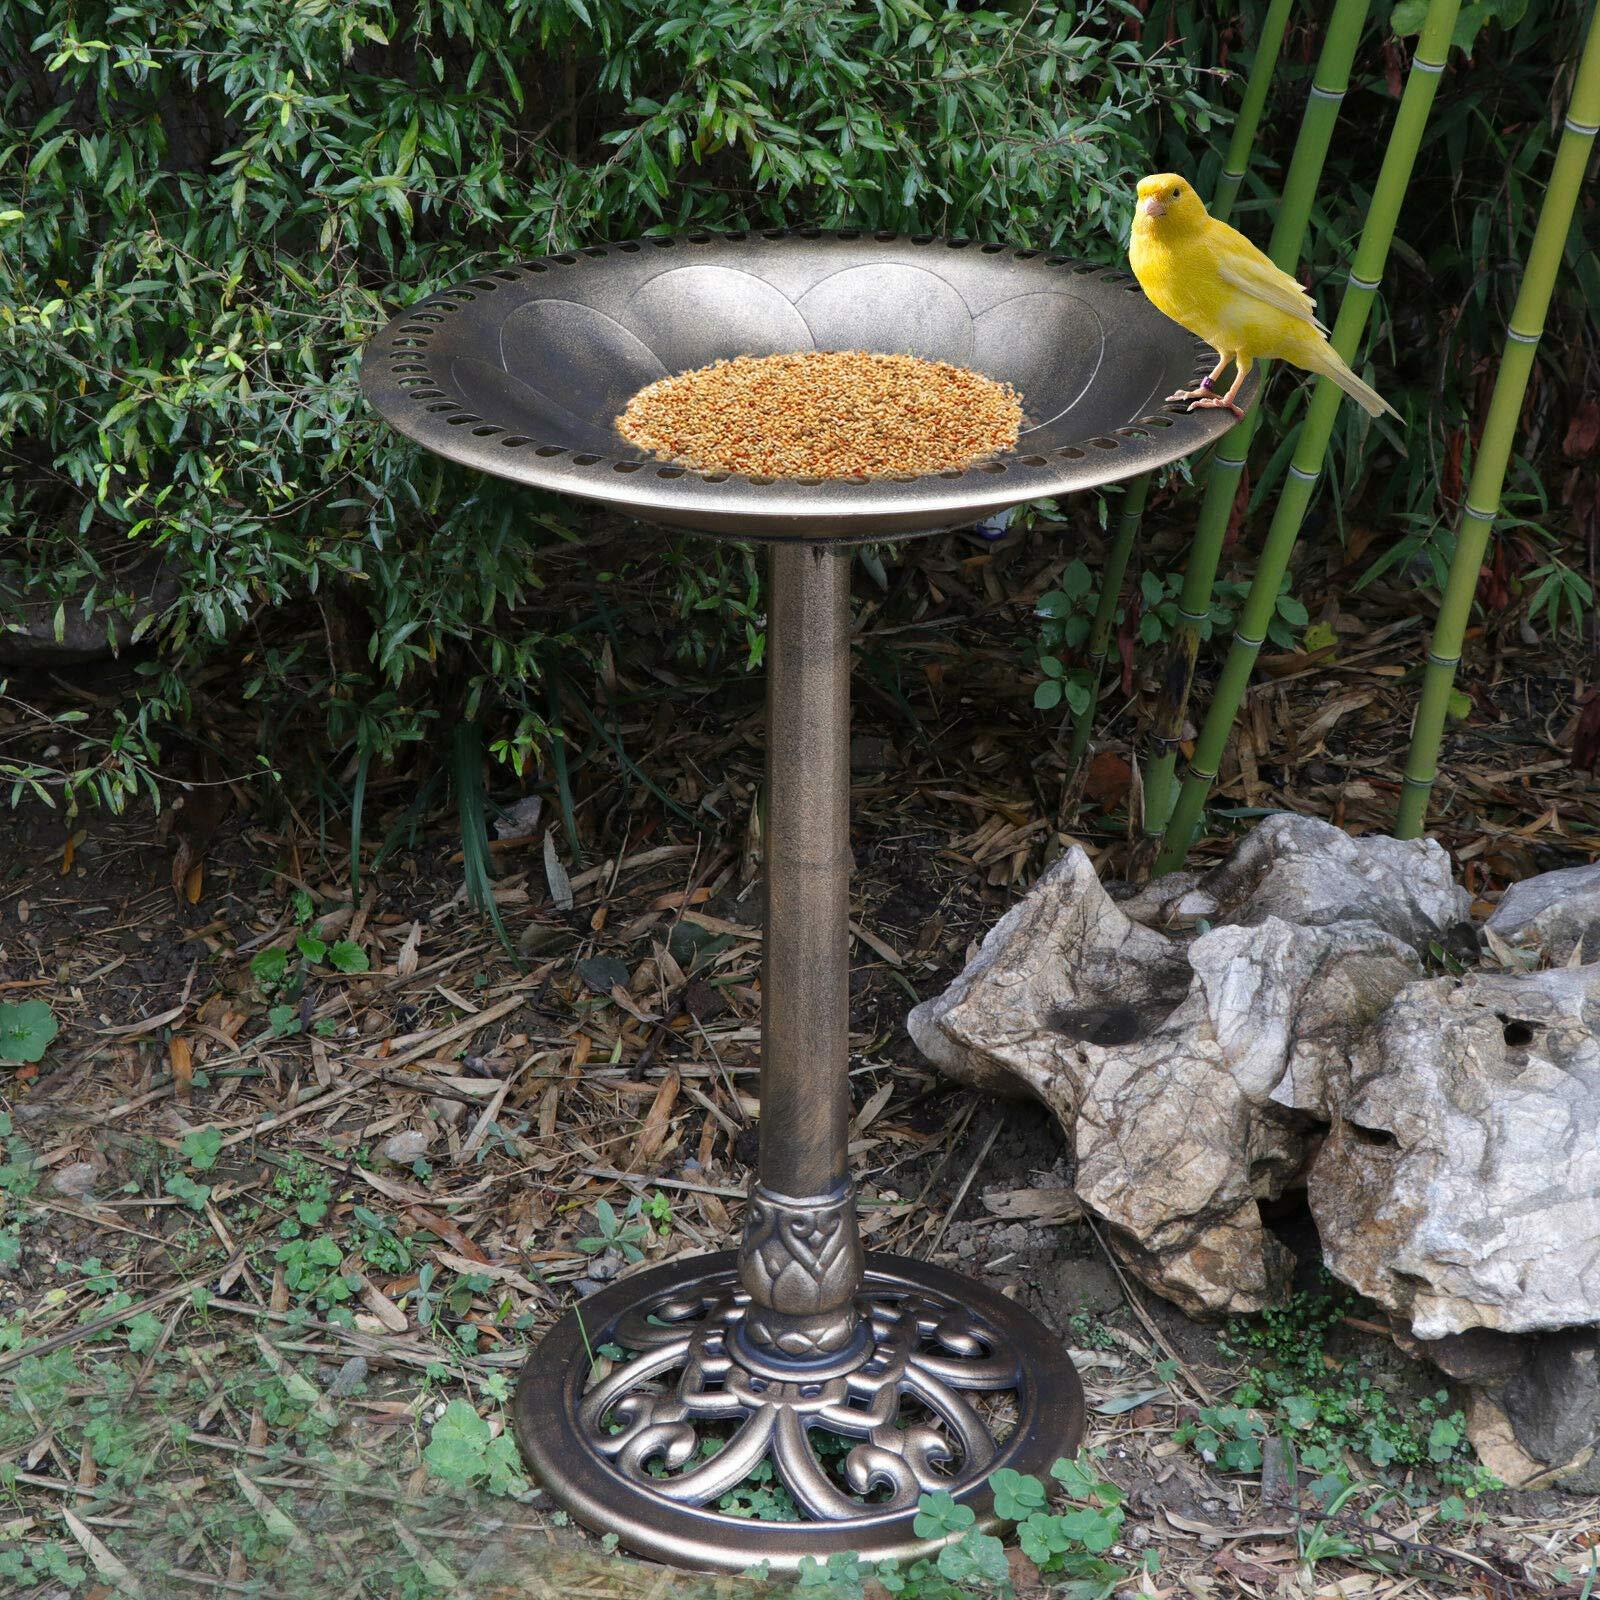 MATAS 28Inch Birdbath Height Pedestal Bird Bath Antique Outdoor Garden Decor Vintage